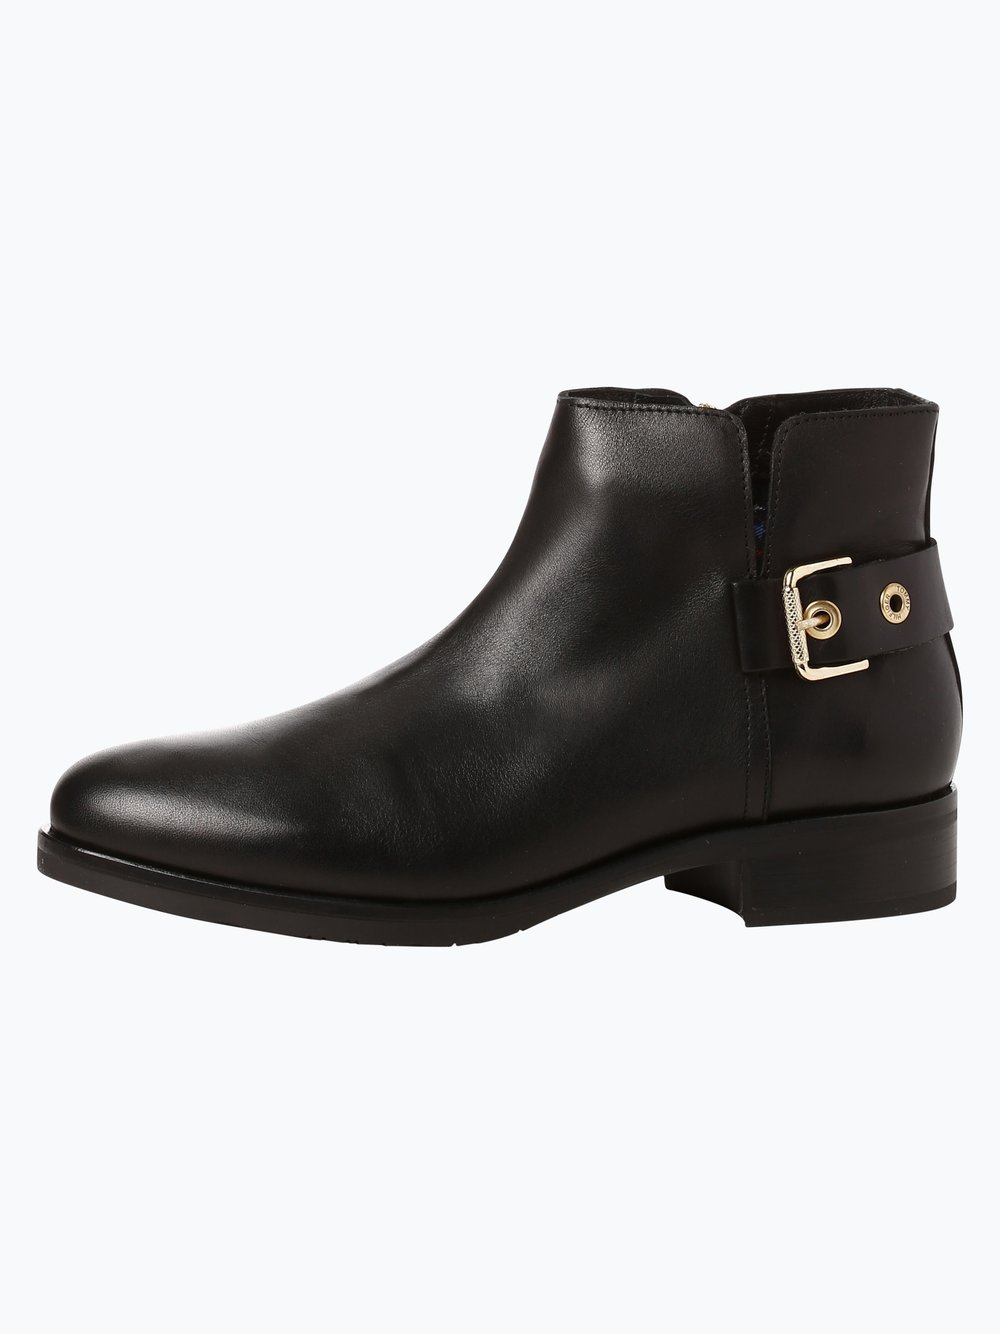 new product 749a2 0328c Tommy Hilfiger Damen Stiefeletten aus Leder - Tessa online ...